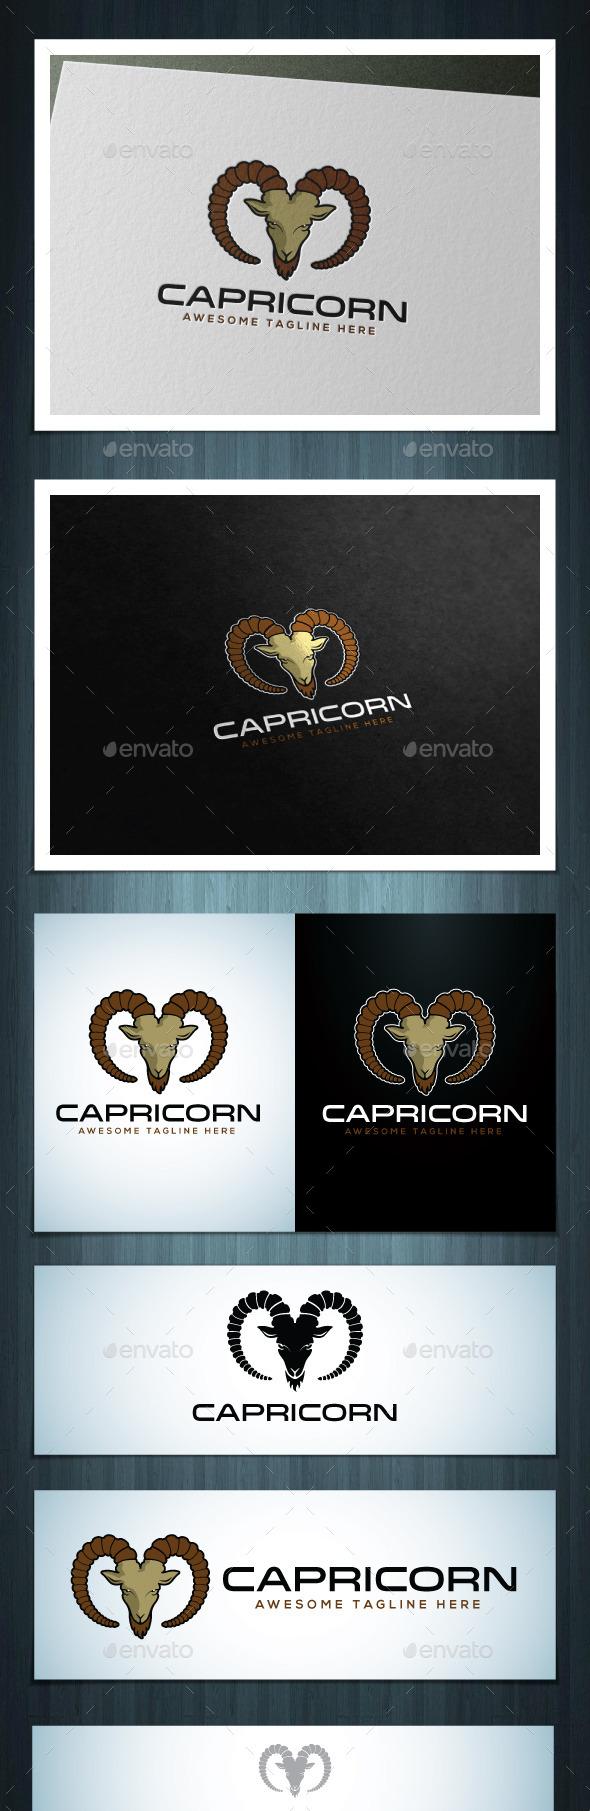 Capricorn - Vector Abstract